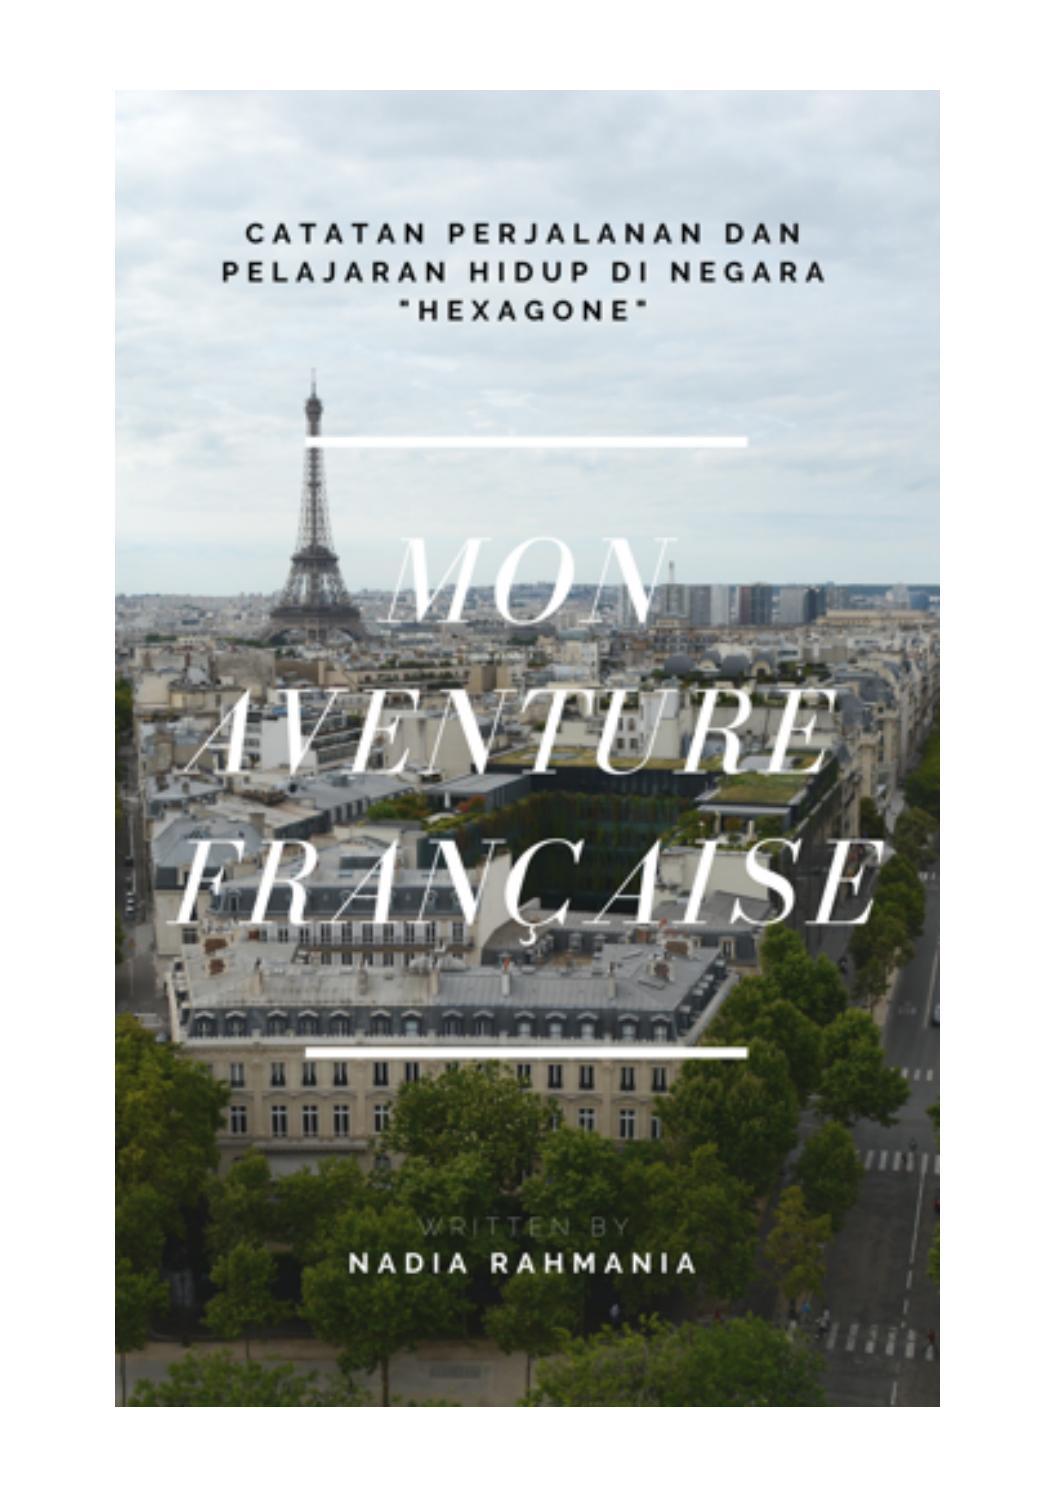 Mon Aventure Fran§aise By Nadia Rahmania Grandis Issuu